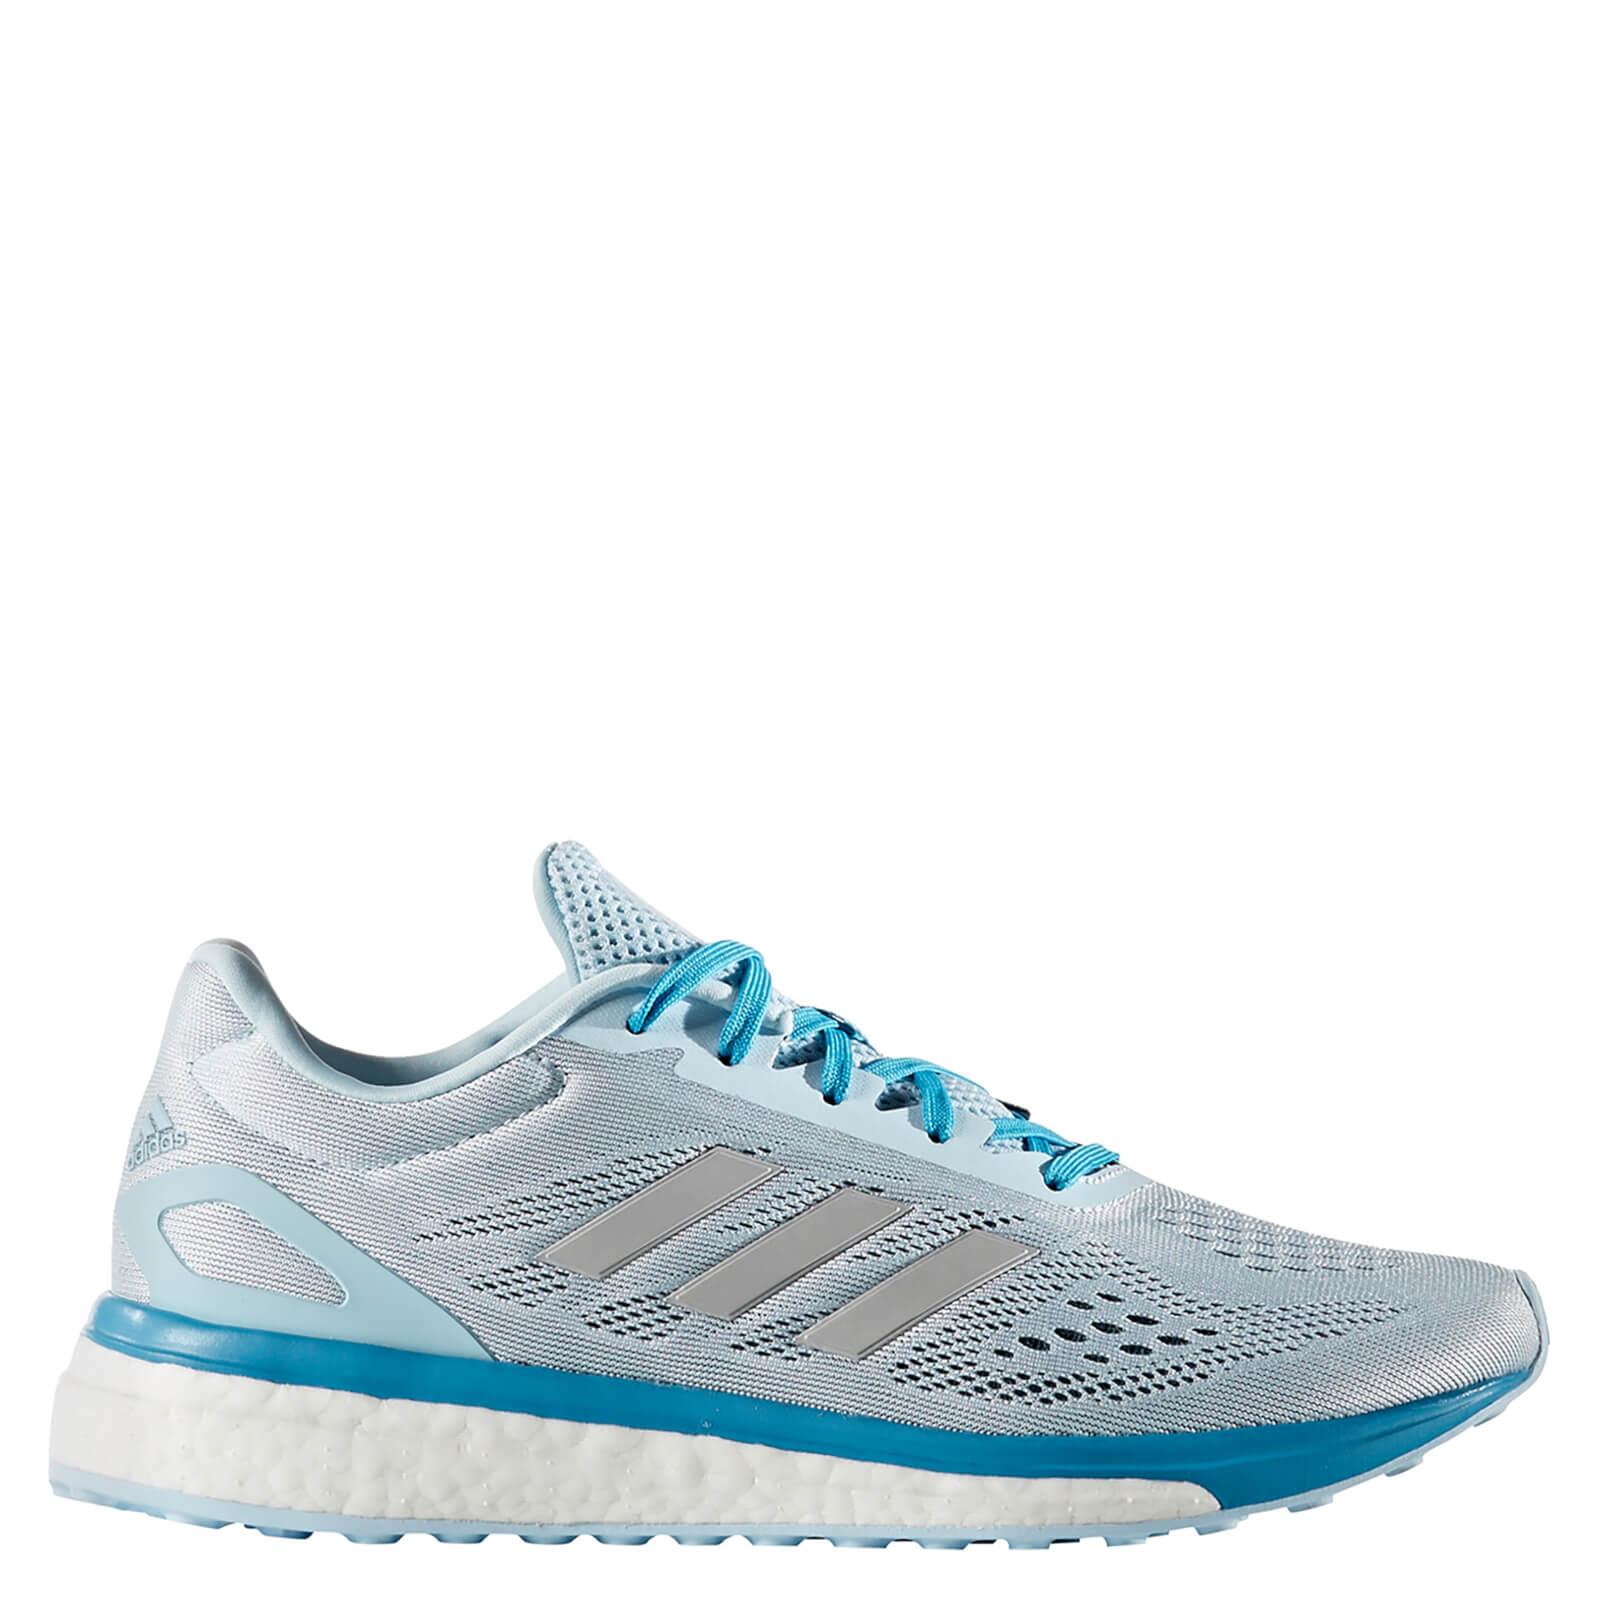 adidas Women's Response LT Running Shoes - Ice Blue/Silver - US 7/UK 5.5 - Blue